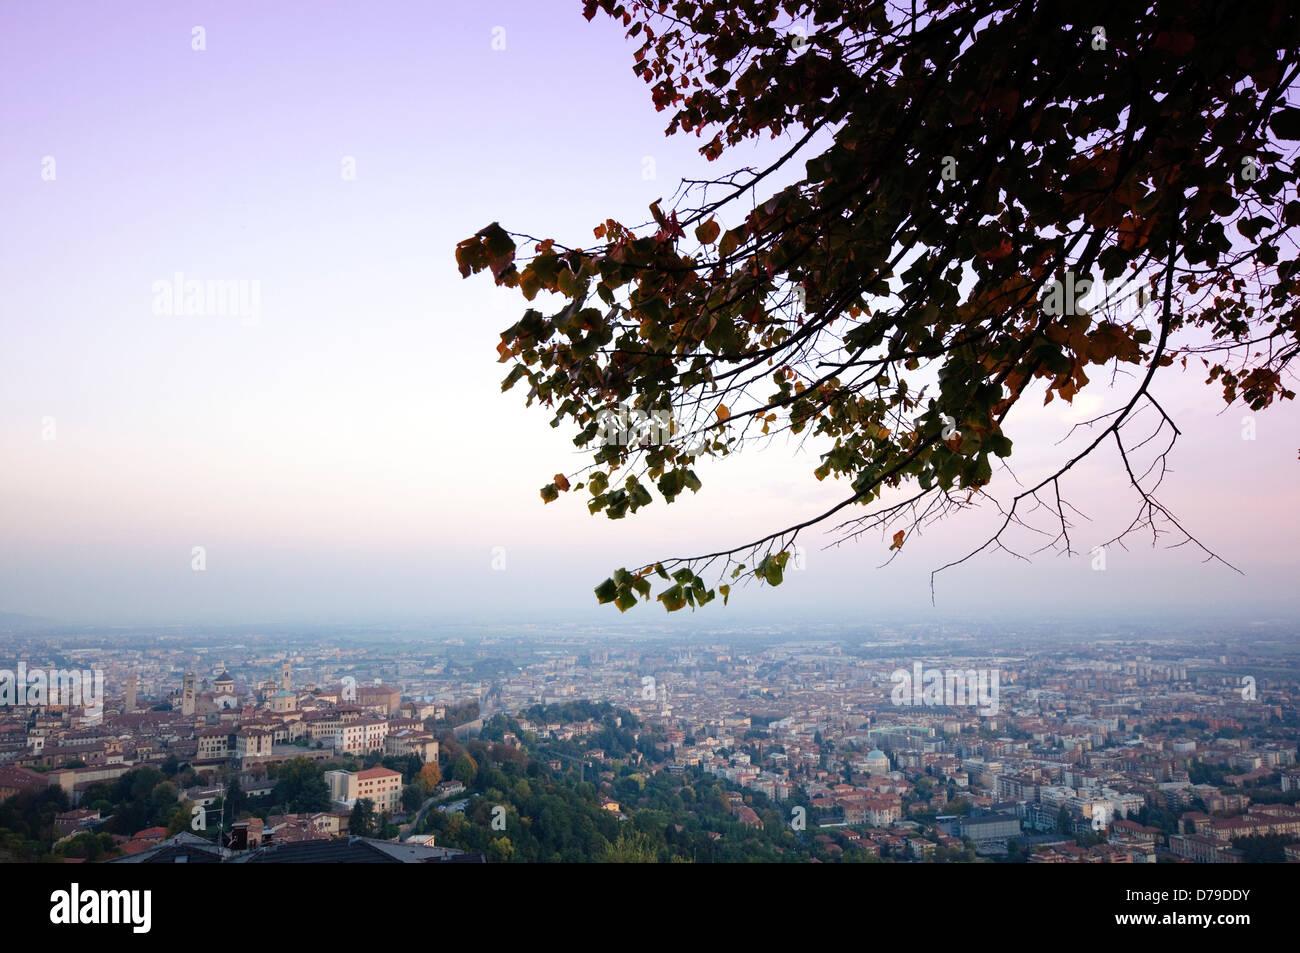 Italy, Lombardy, Bergamo, Citta Alta High Town, Seen From San Vigilio at Sunset - Stock Image